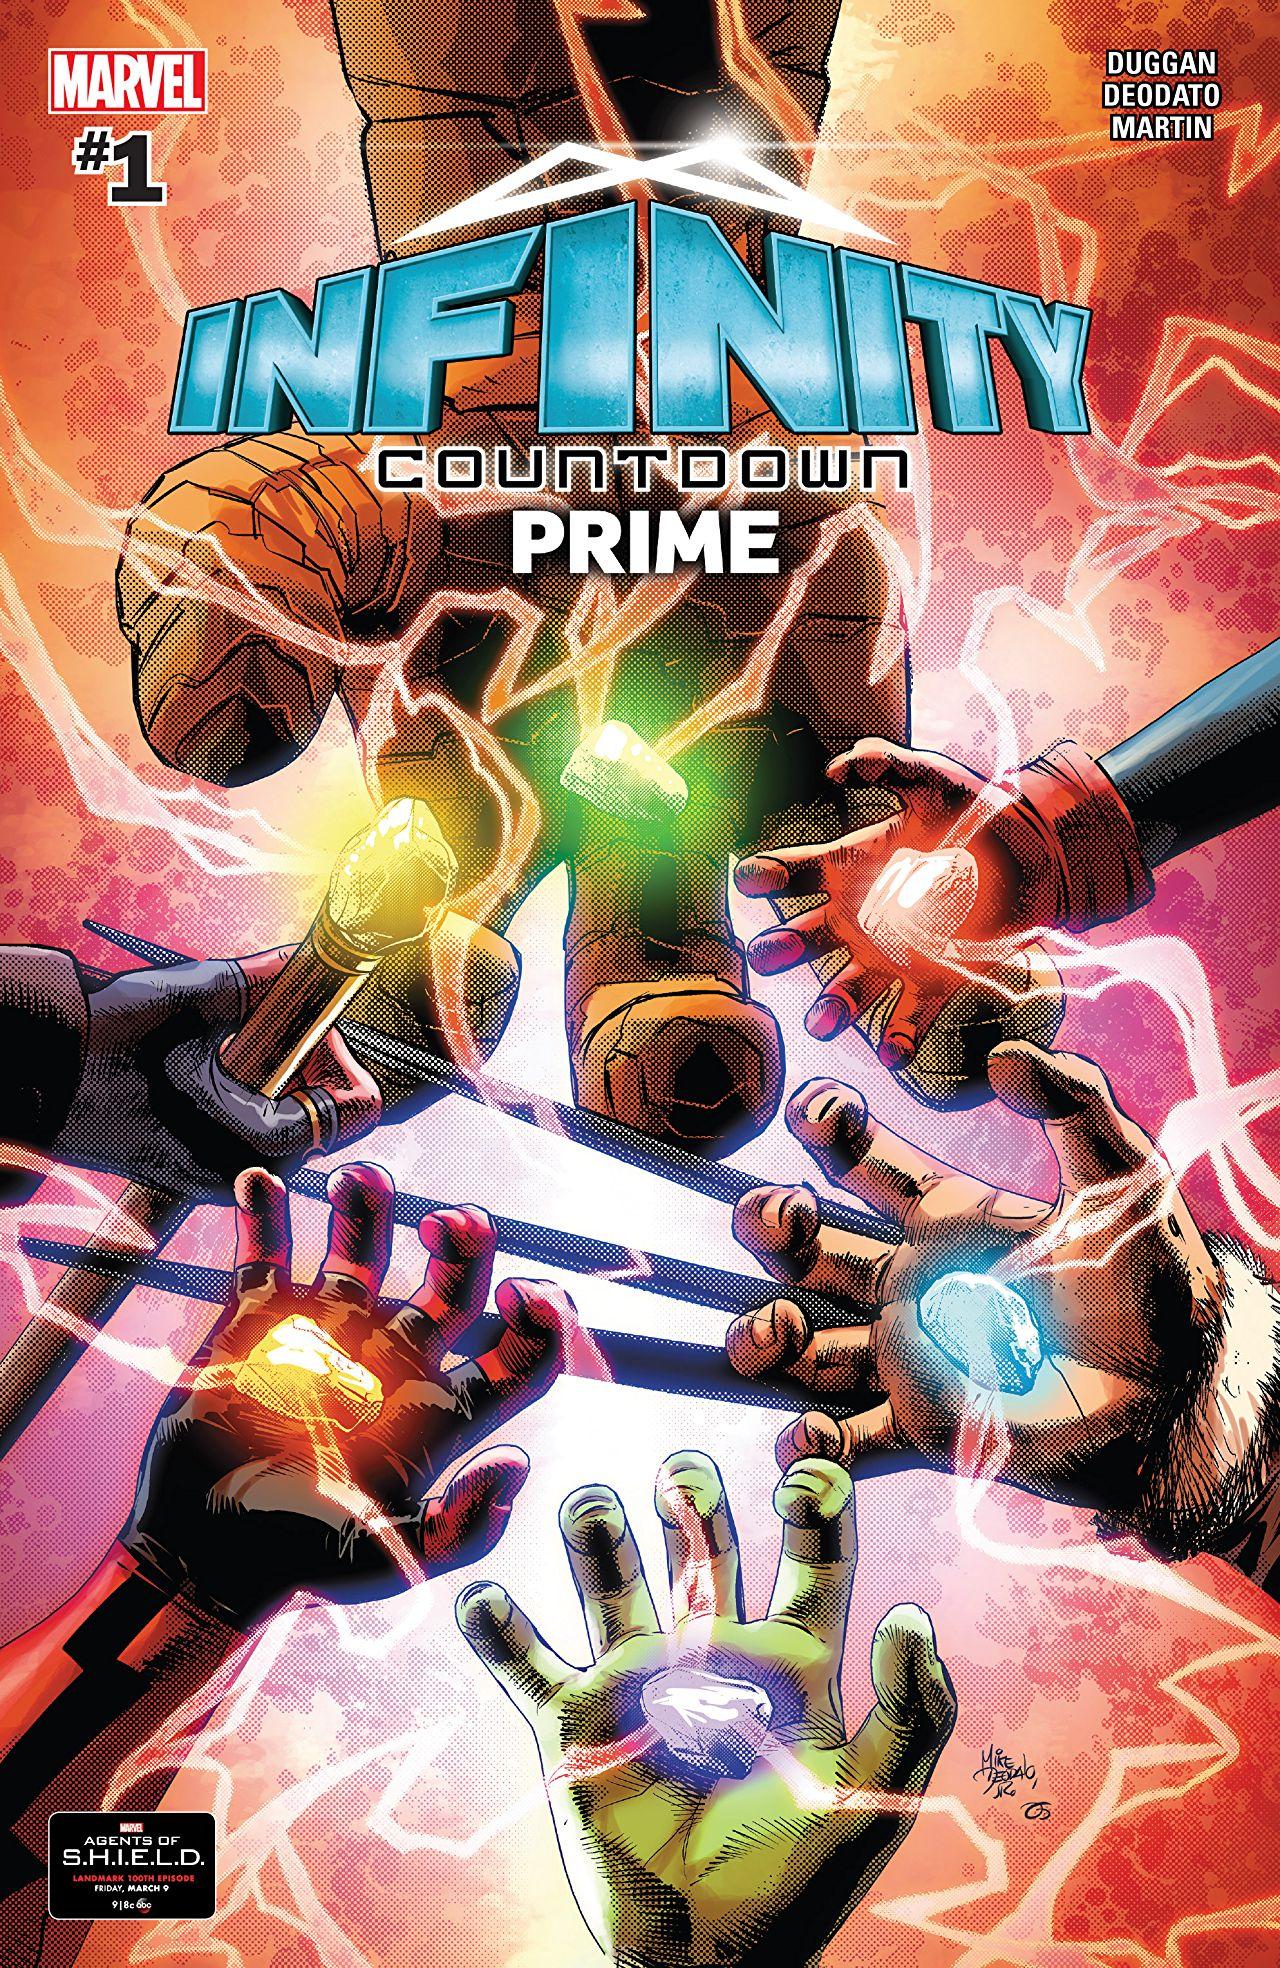 Infinity Countdown Prime (2018) #1 (Digital @ Comixology - please read description)